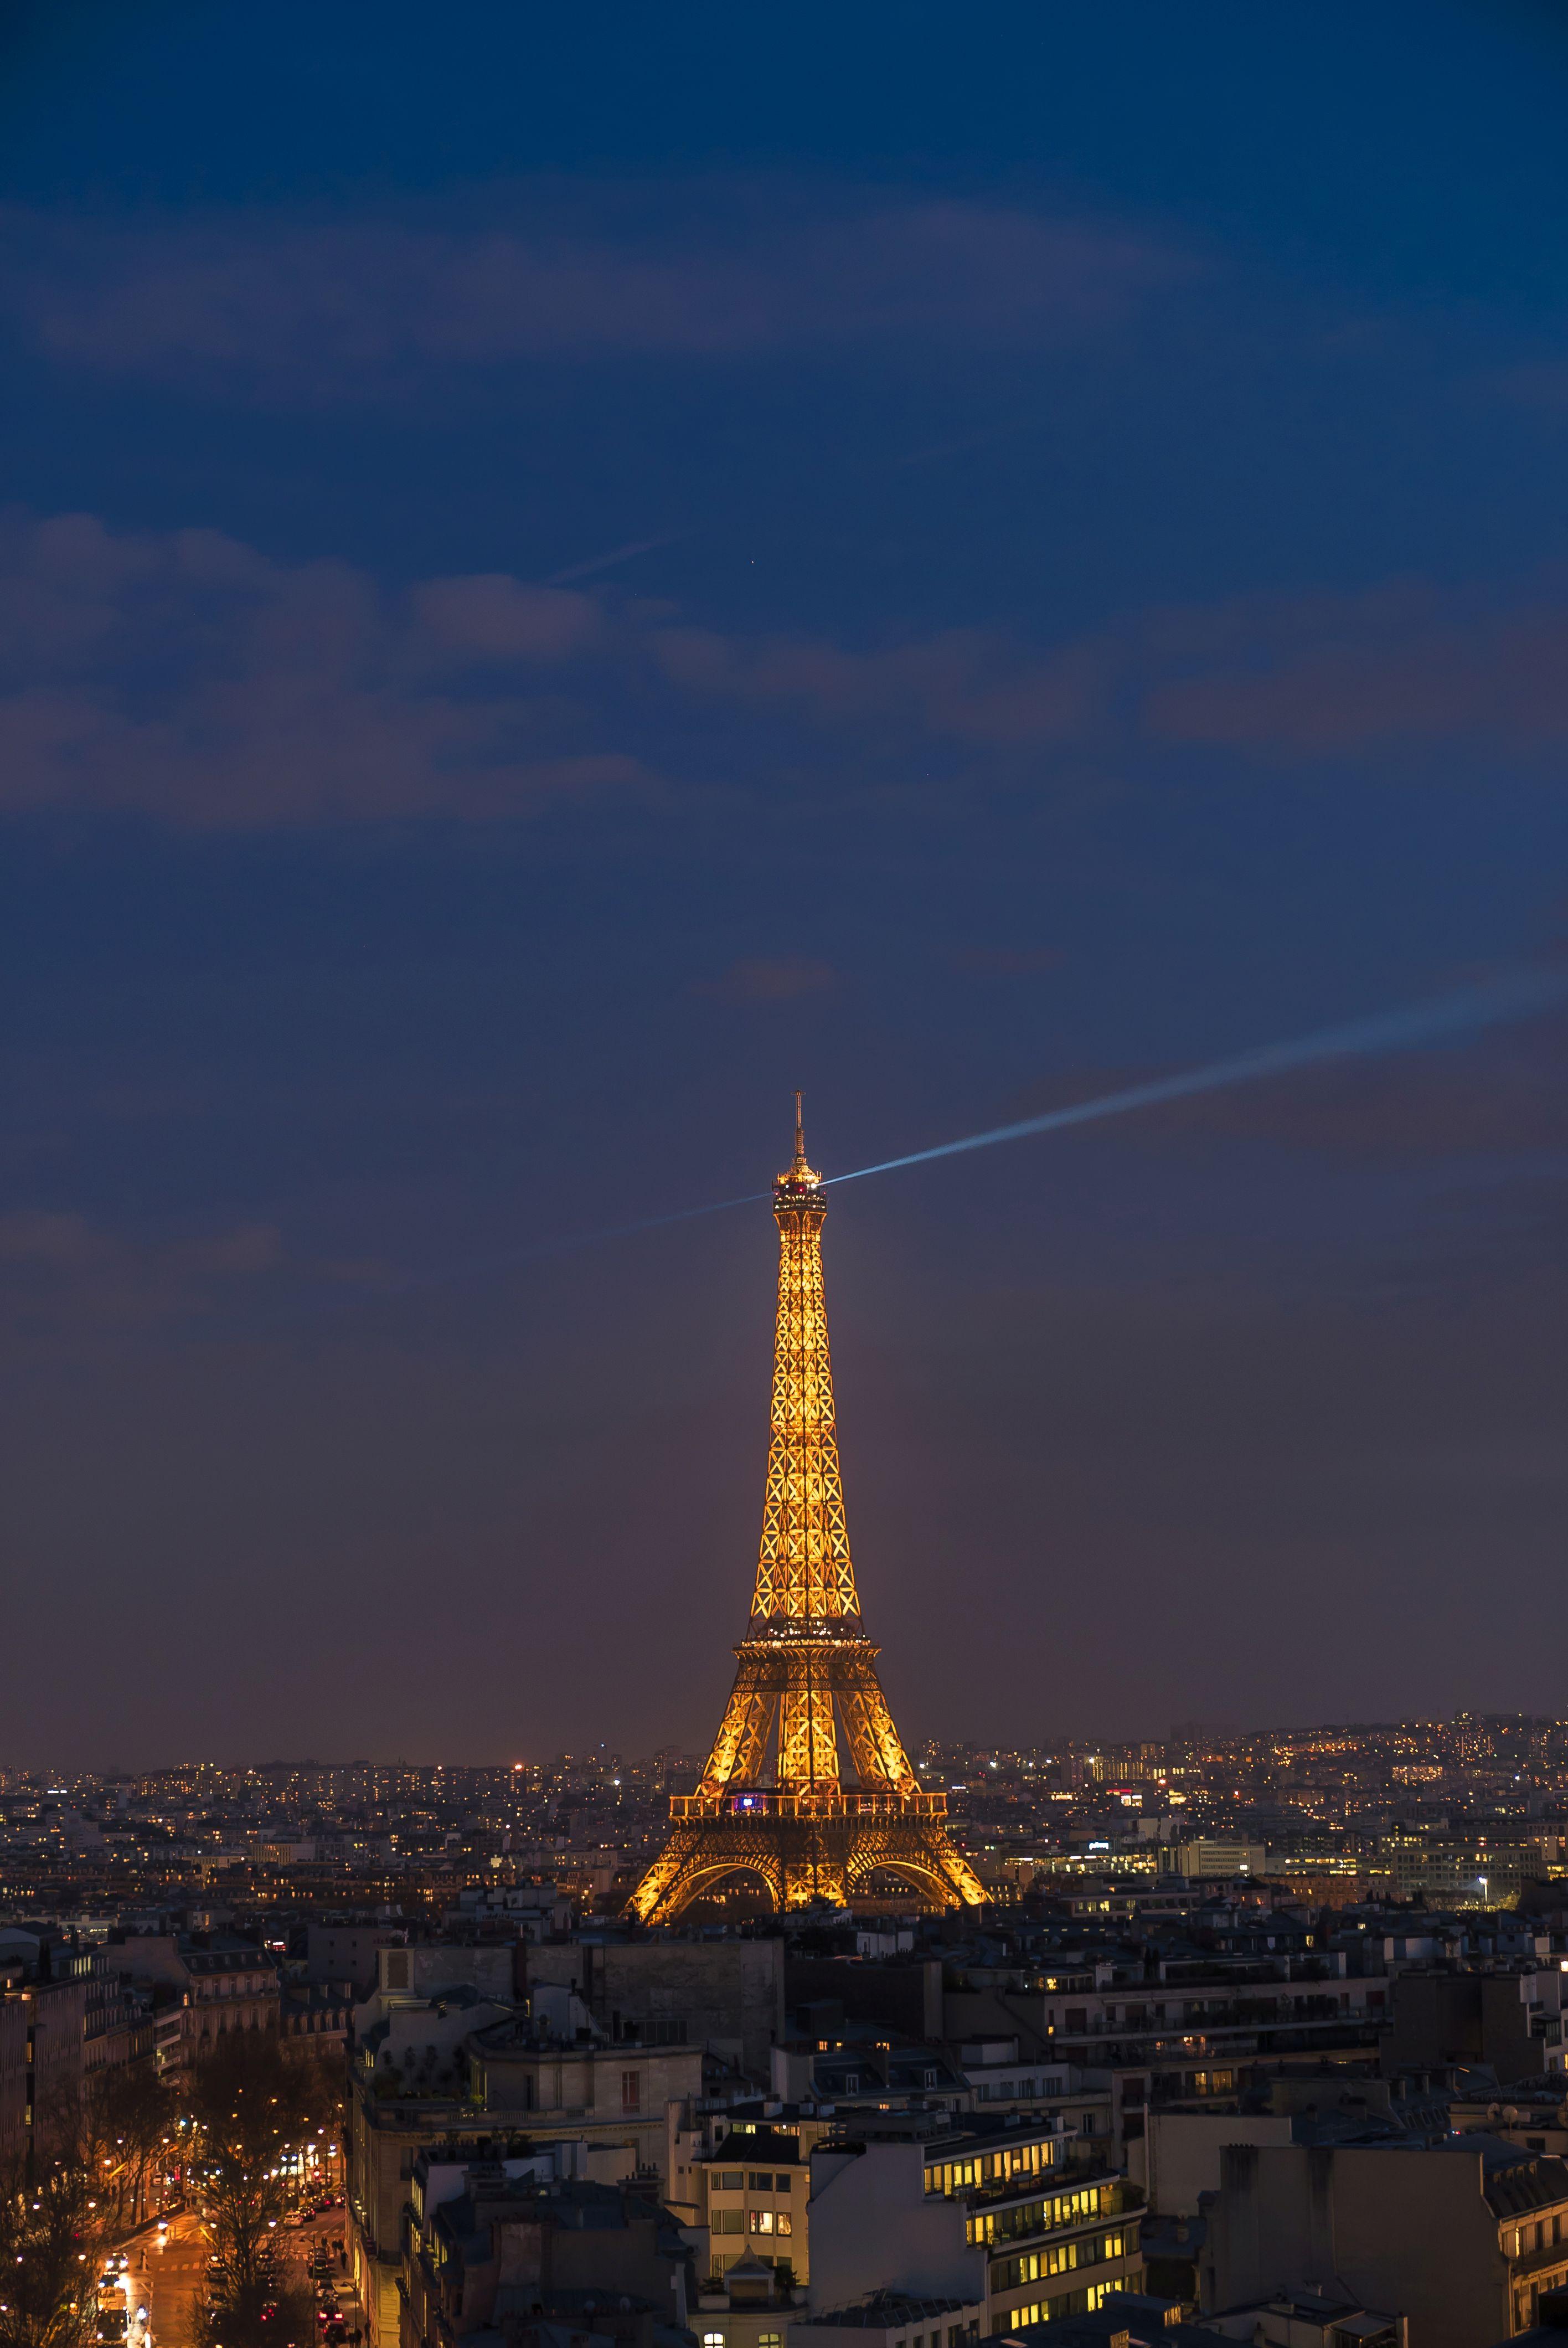 Turnul Eiffel atrage anual milioane de vizitatori din întreaga lume. Sursa foto:hepta.ro